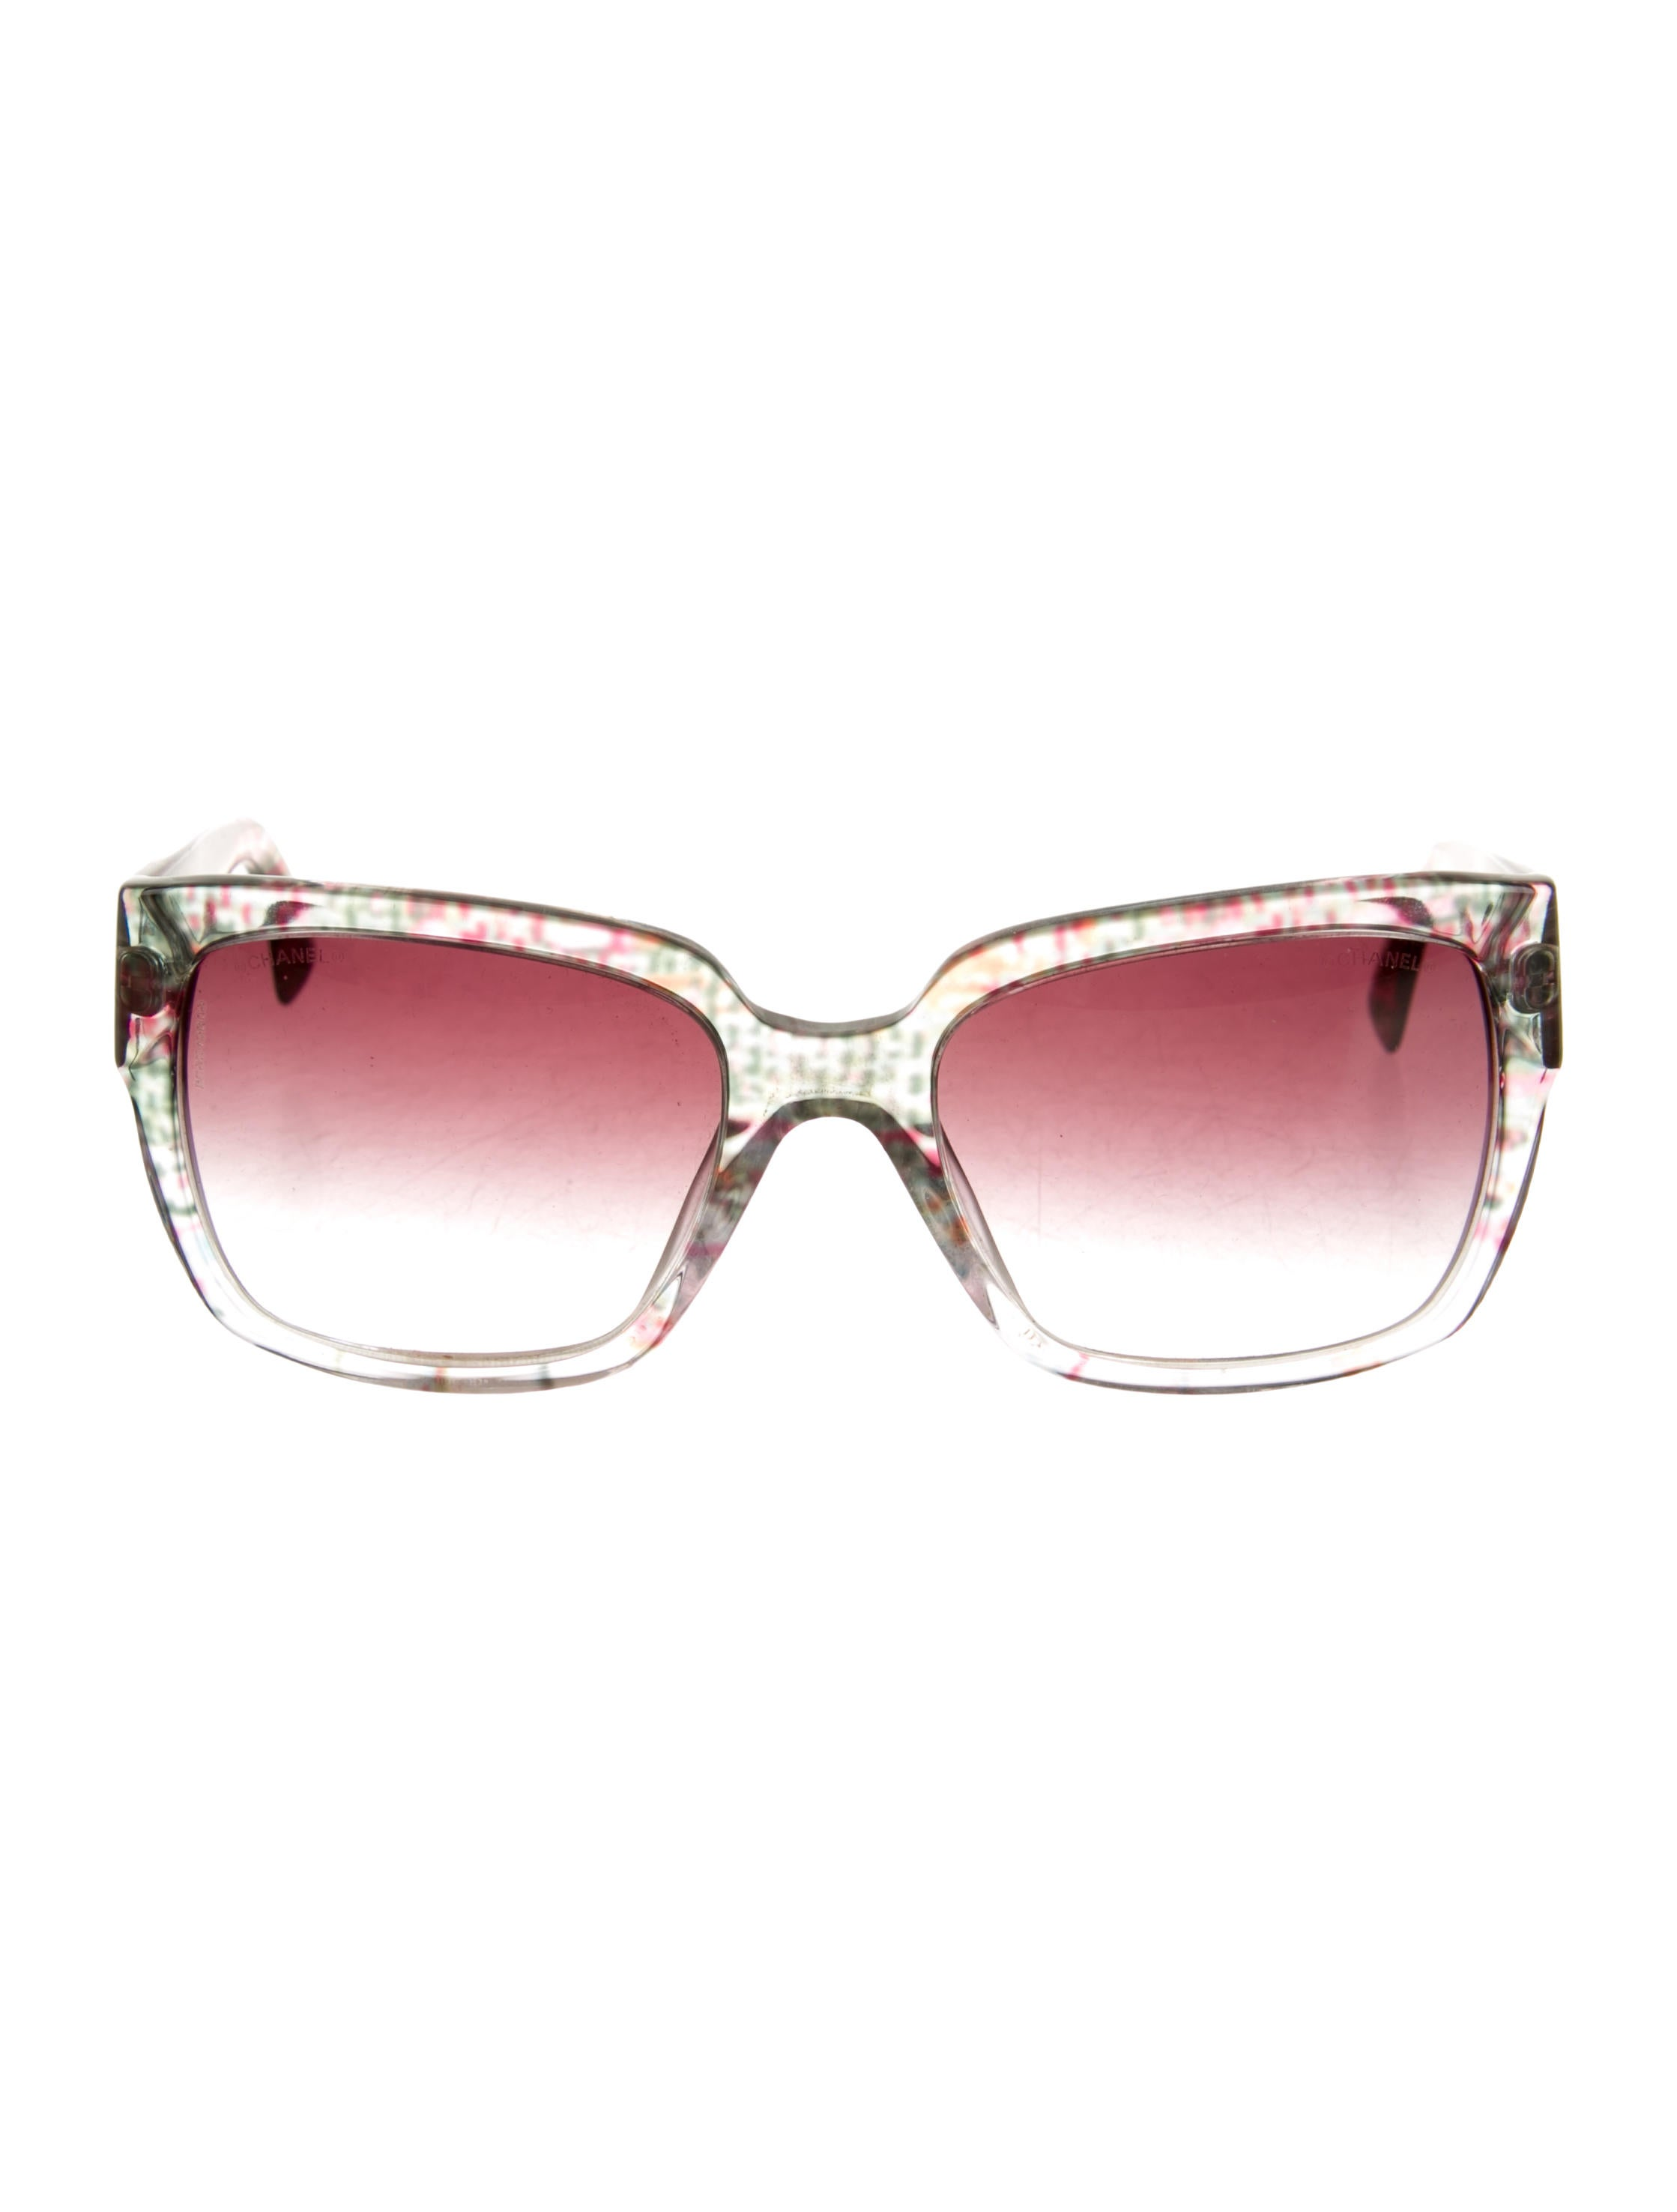 Chanel Tweed Eyeglass Frames : Chanel Tweed Frame Sunglasses - Accessories - CHA80126 ...